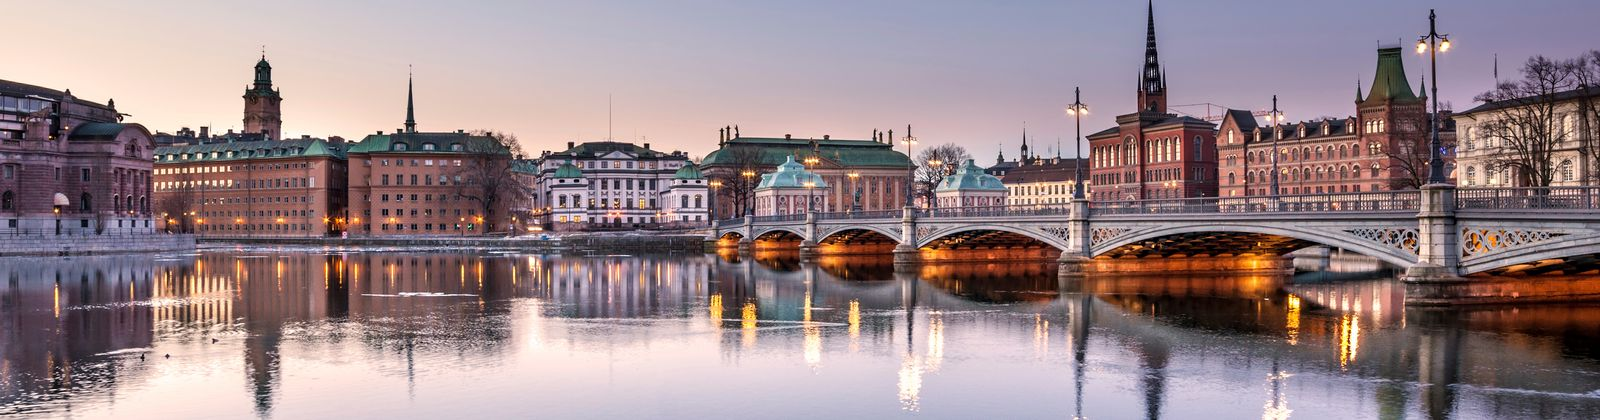 die top 10 sehensw rdigkeiten in stockholm. Black Bedroom Furniture Sets. Home Design Ideas